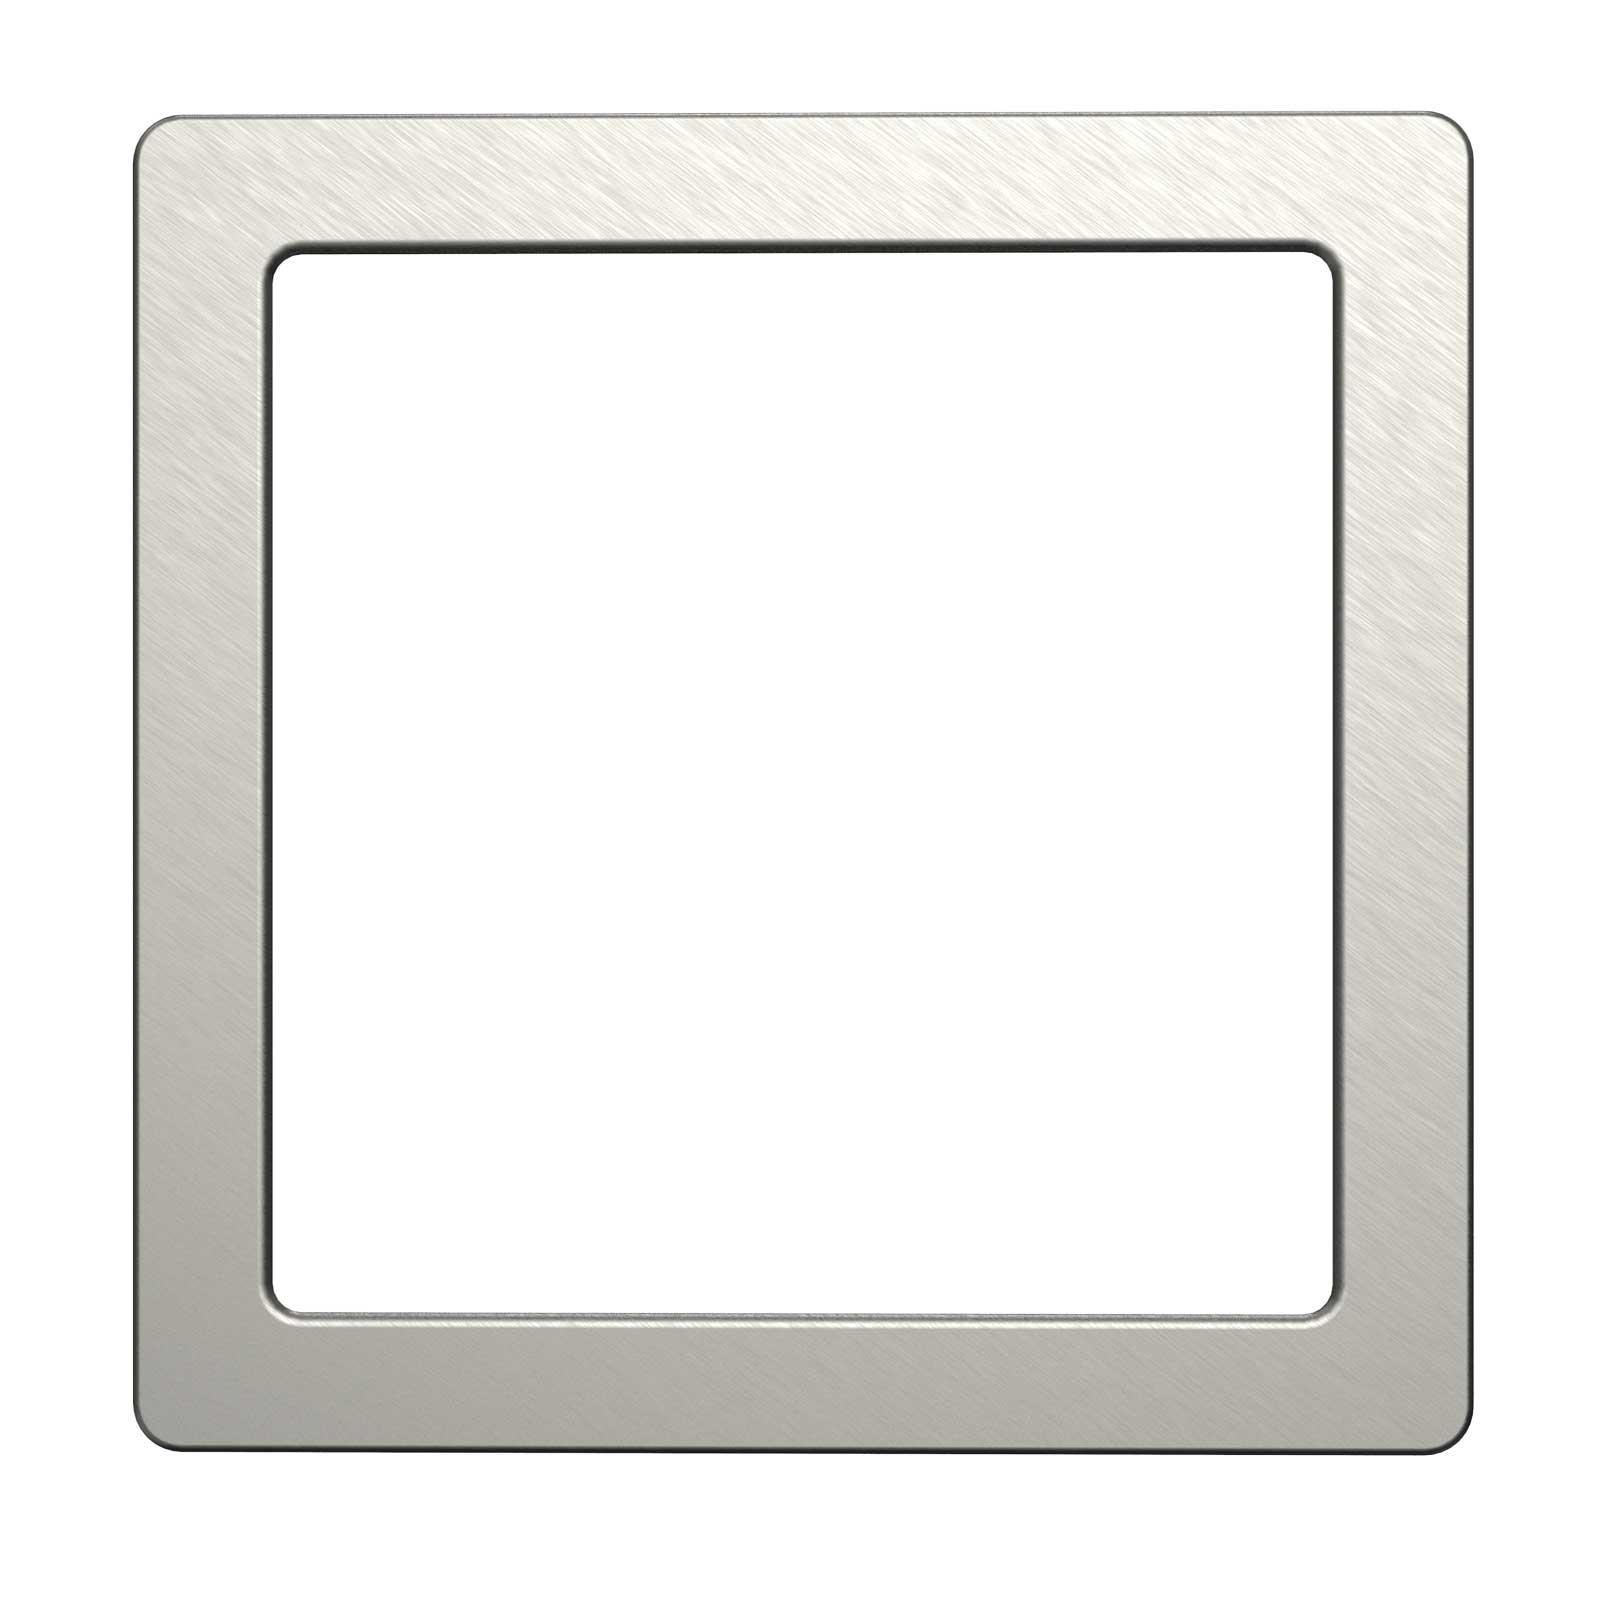 Megatron Pano magnetic cover angular Ø 29.2cm